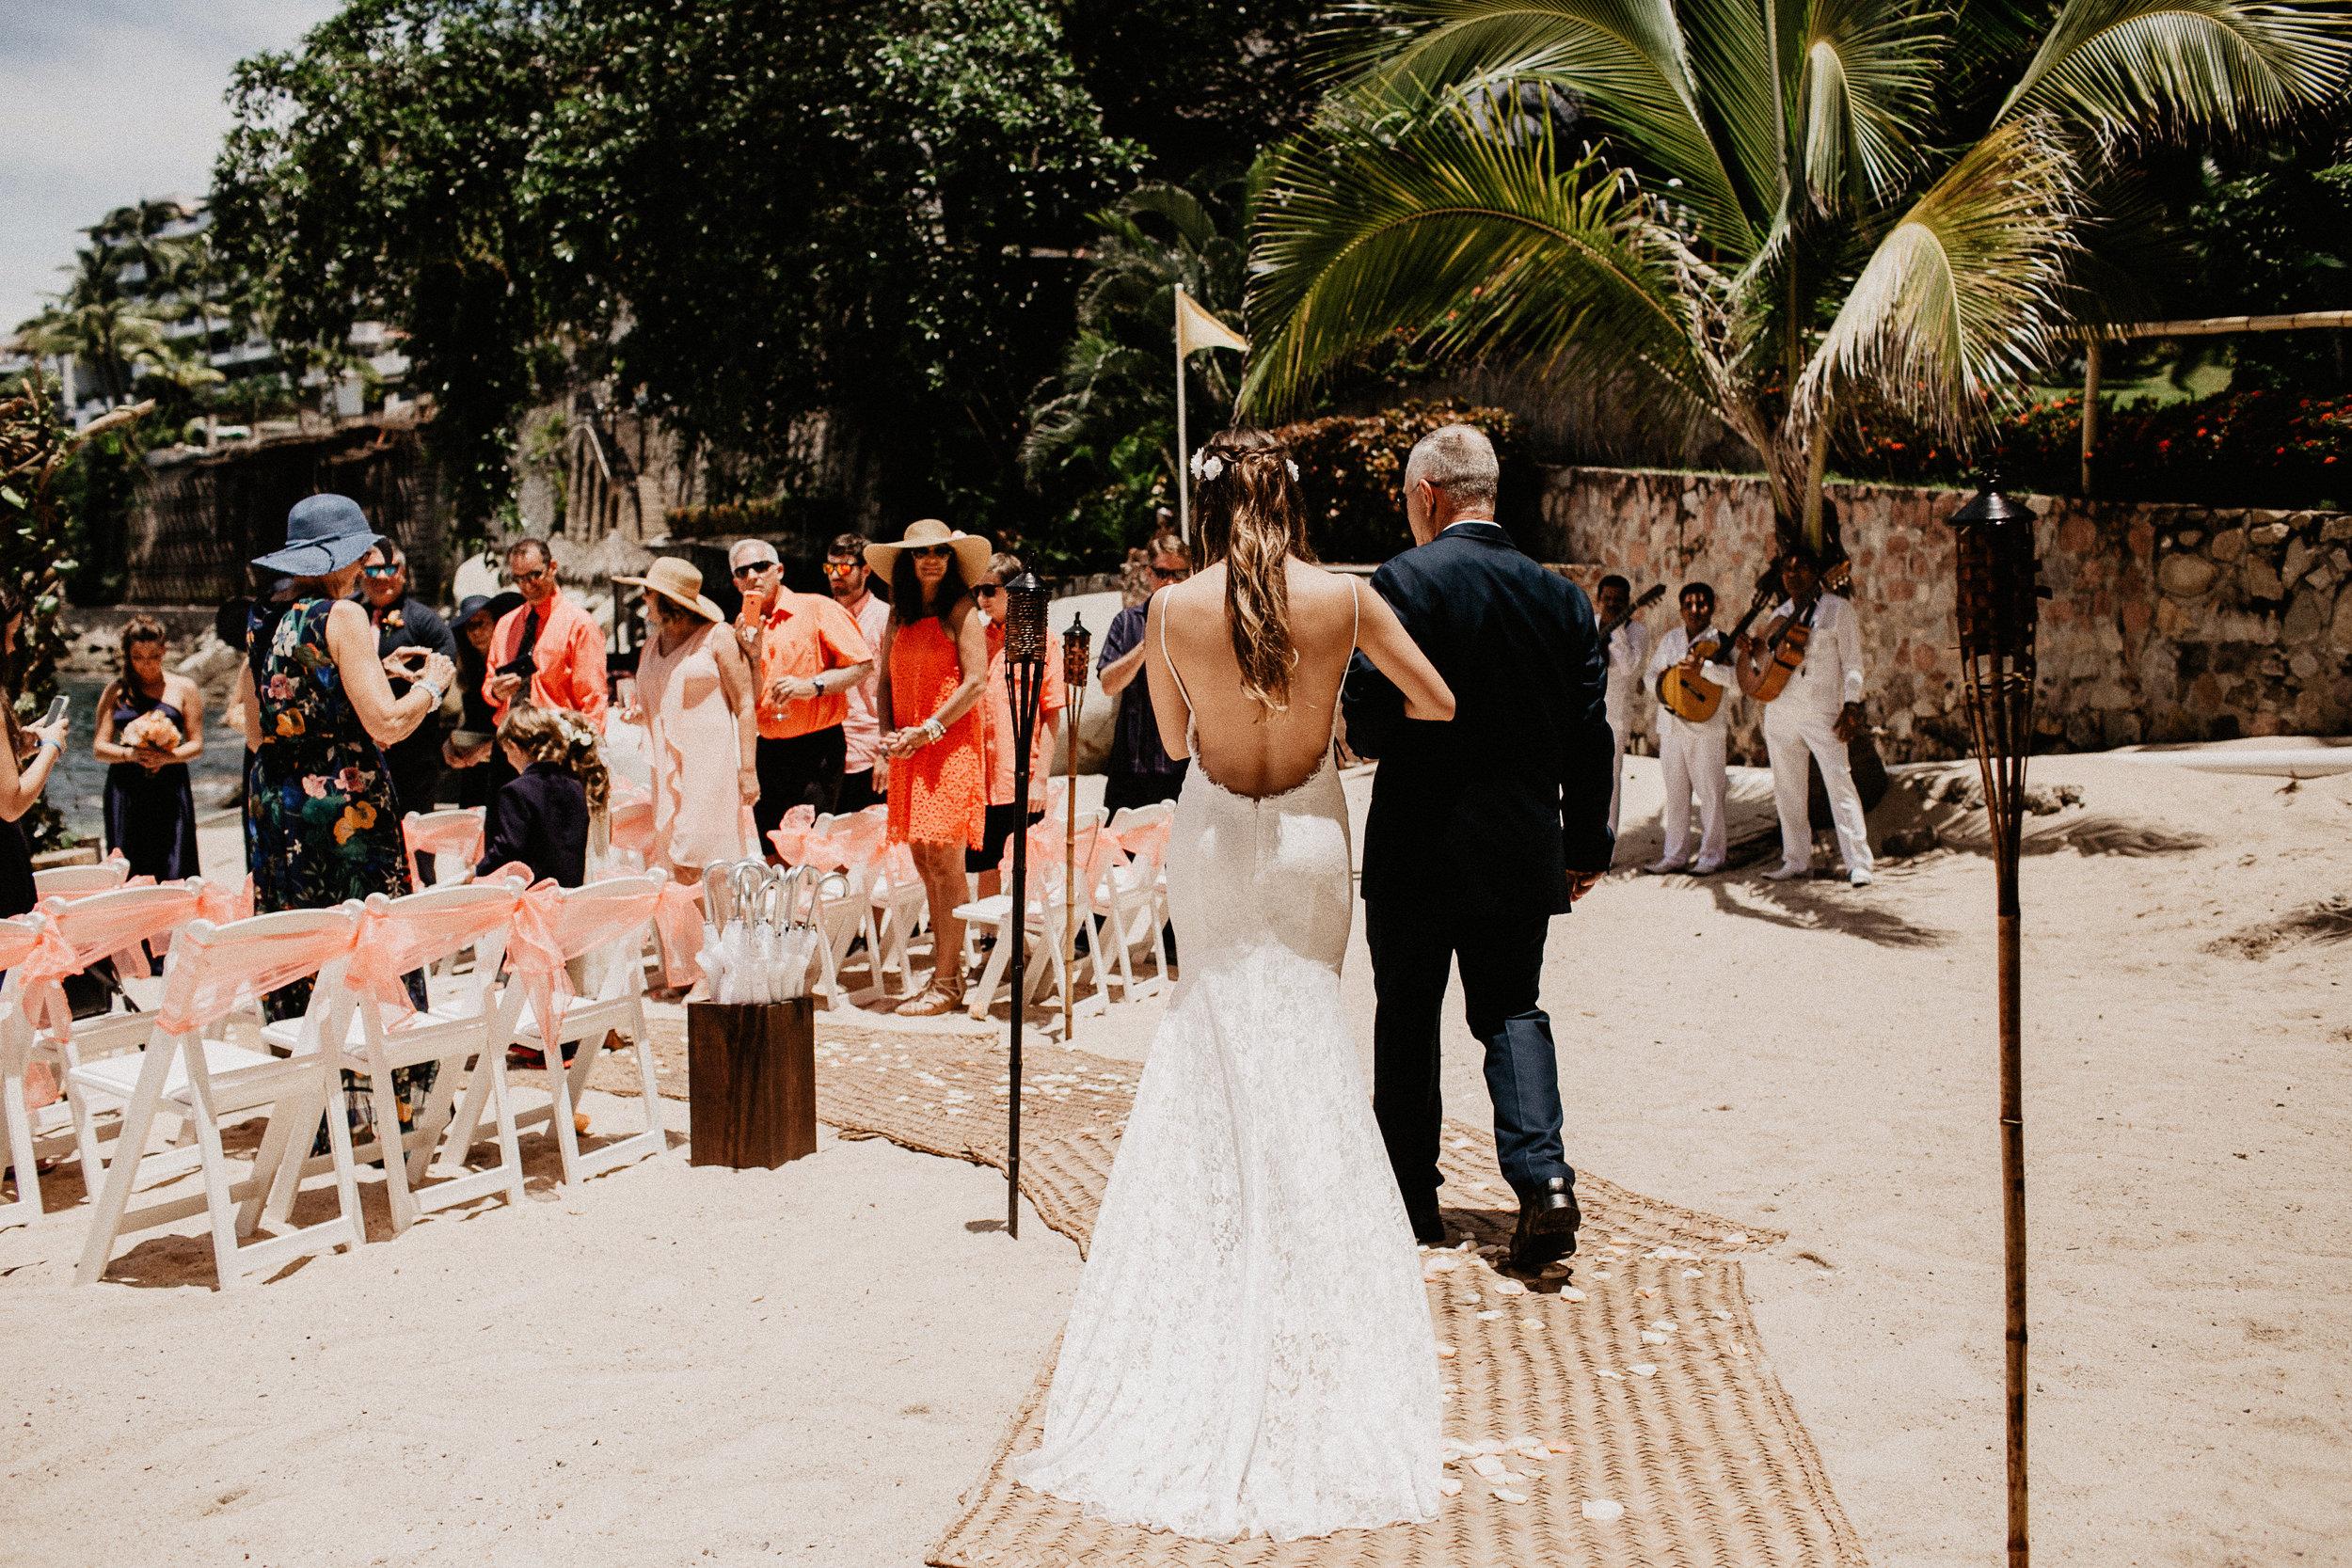 alfonso_flores_destination_wedding_photography_puerto_vallarta_hotel_barcelo_vallarta_cuttler_amela-212.JPG